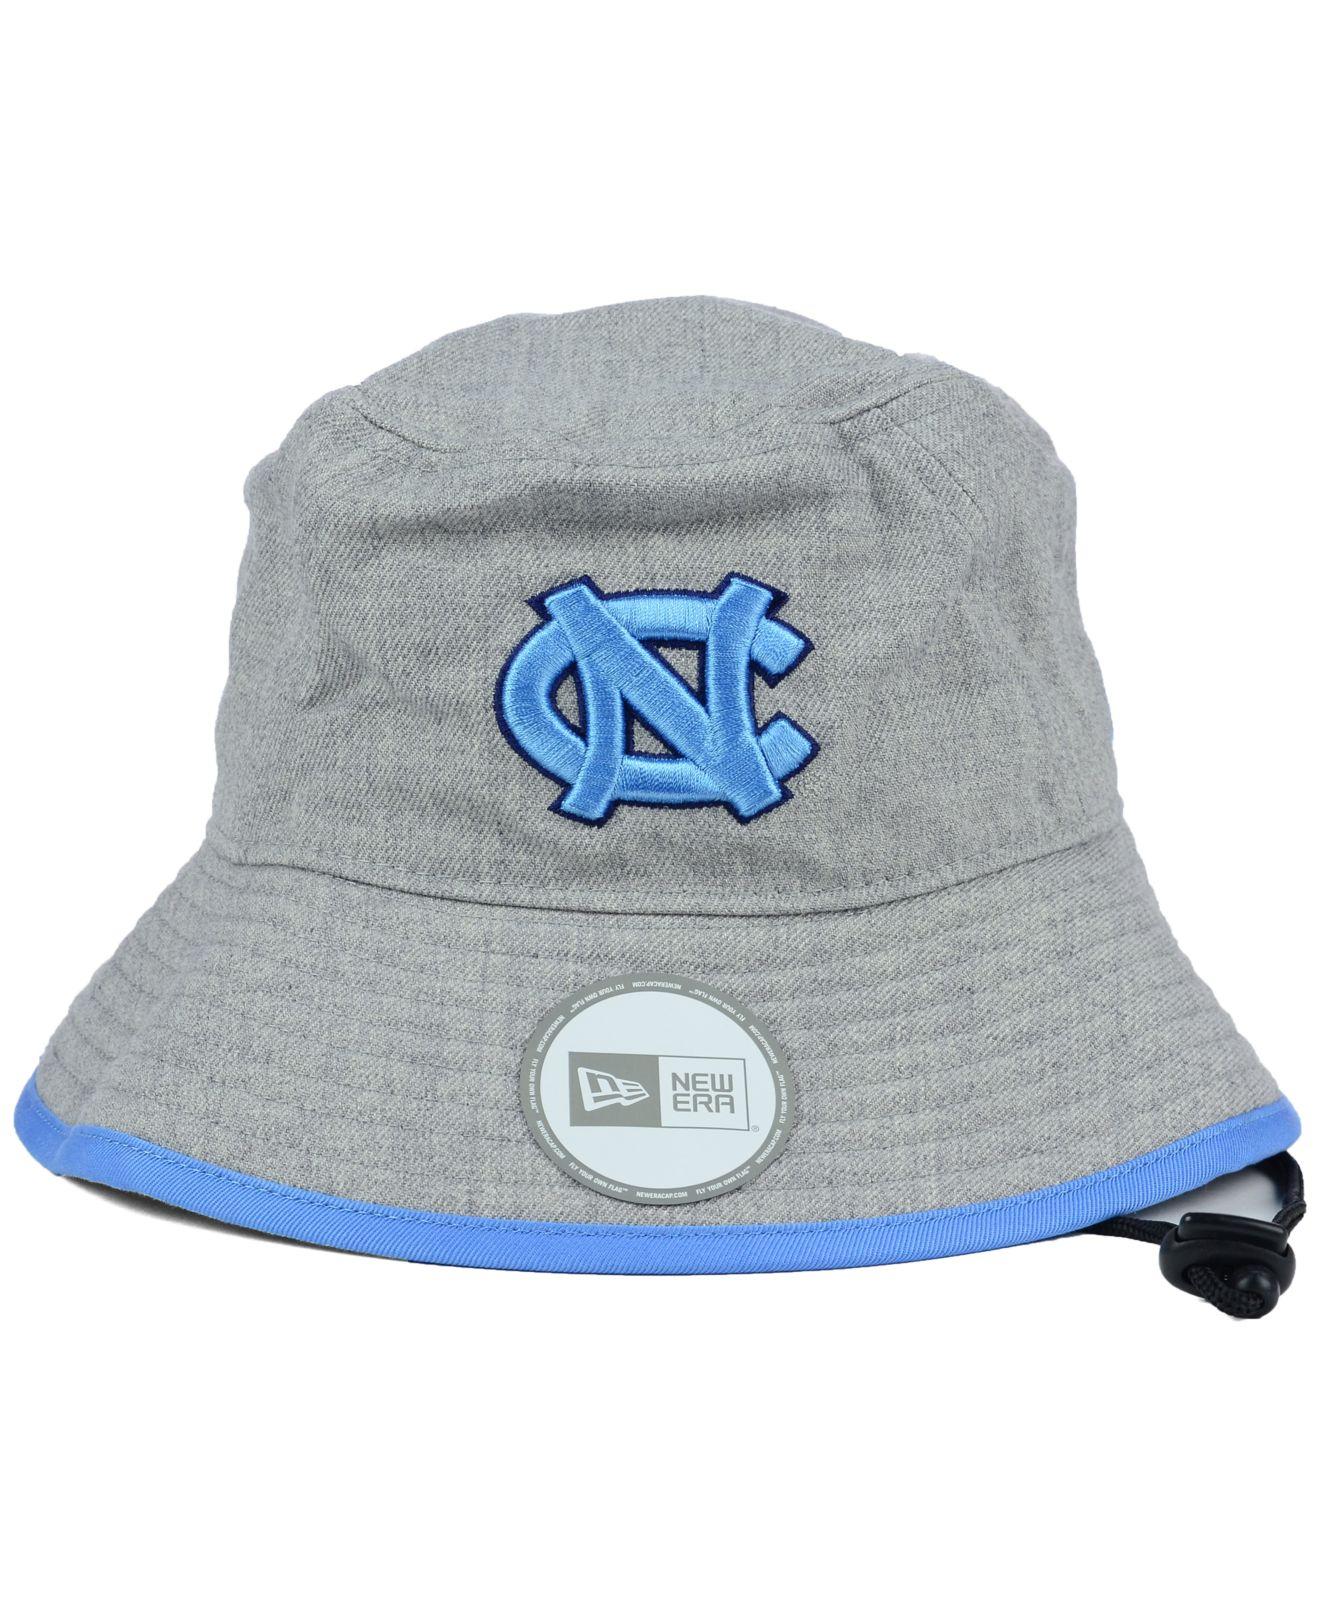 ... low cost lyst ktz north carolina tar heels tip bucket hat in gray for  men 397af ... d94a36d0df4